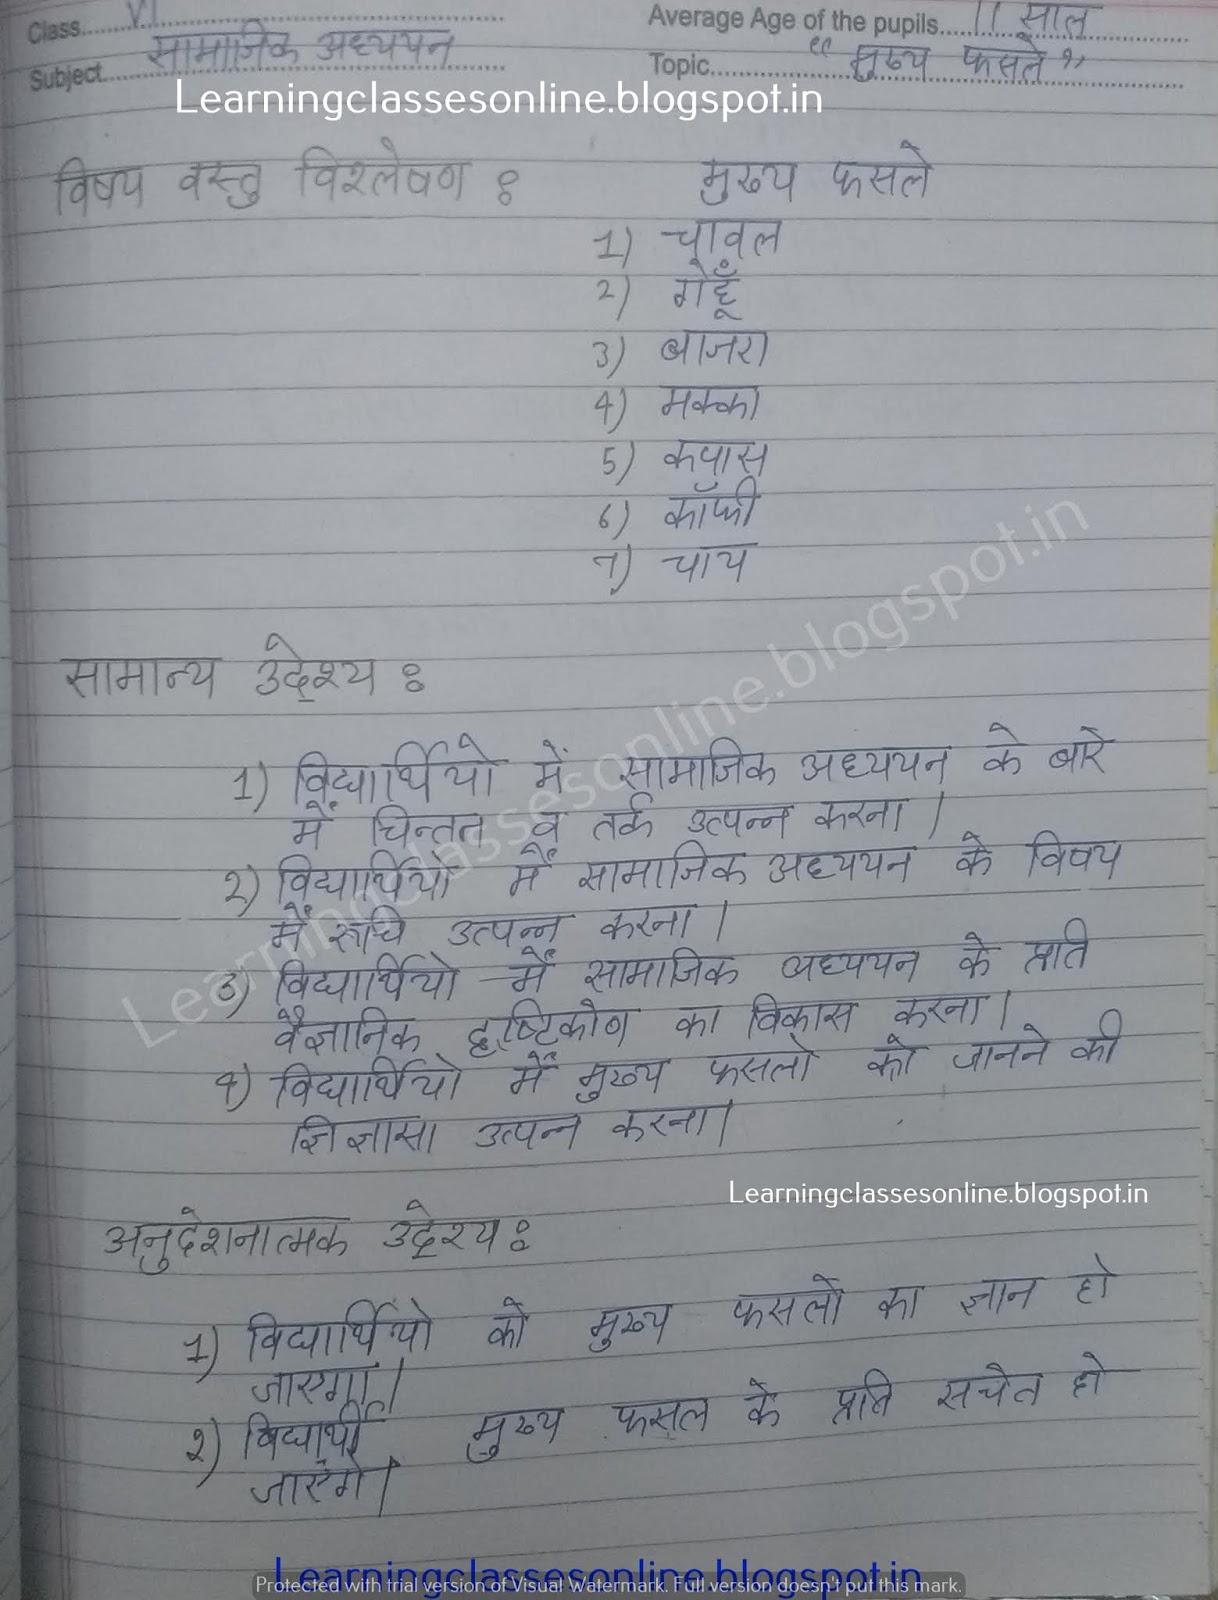 BTC DELED B.Ed Social Science Lesson Plan In Hindi on मुख्य फसले